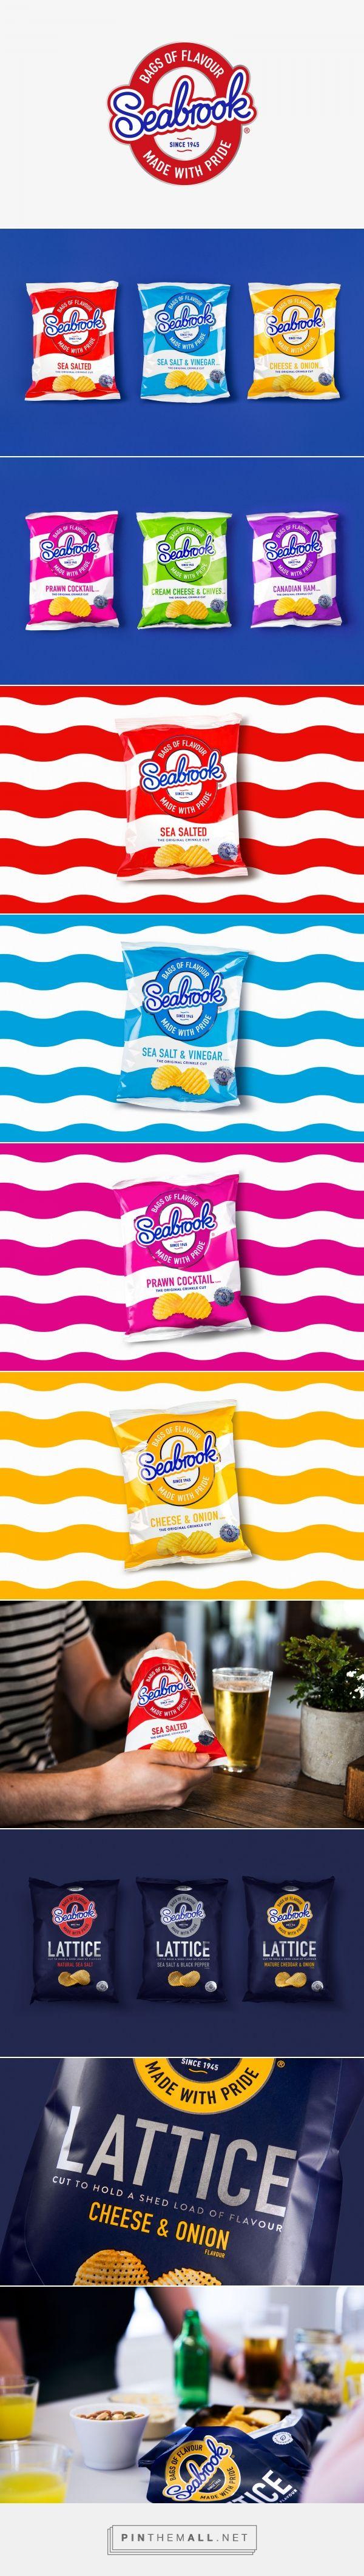 Seabrook | Branding & Packaging Design | Designed by Robot Food | www.robot-food.com